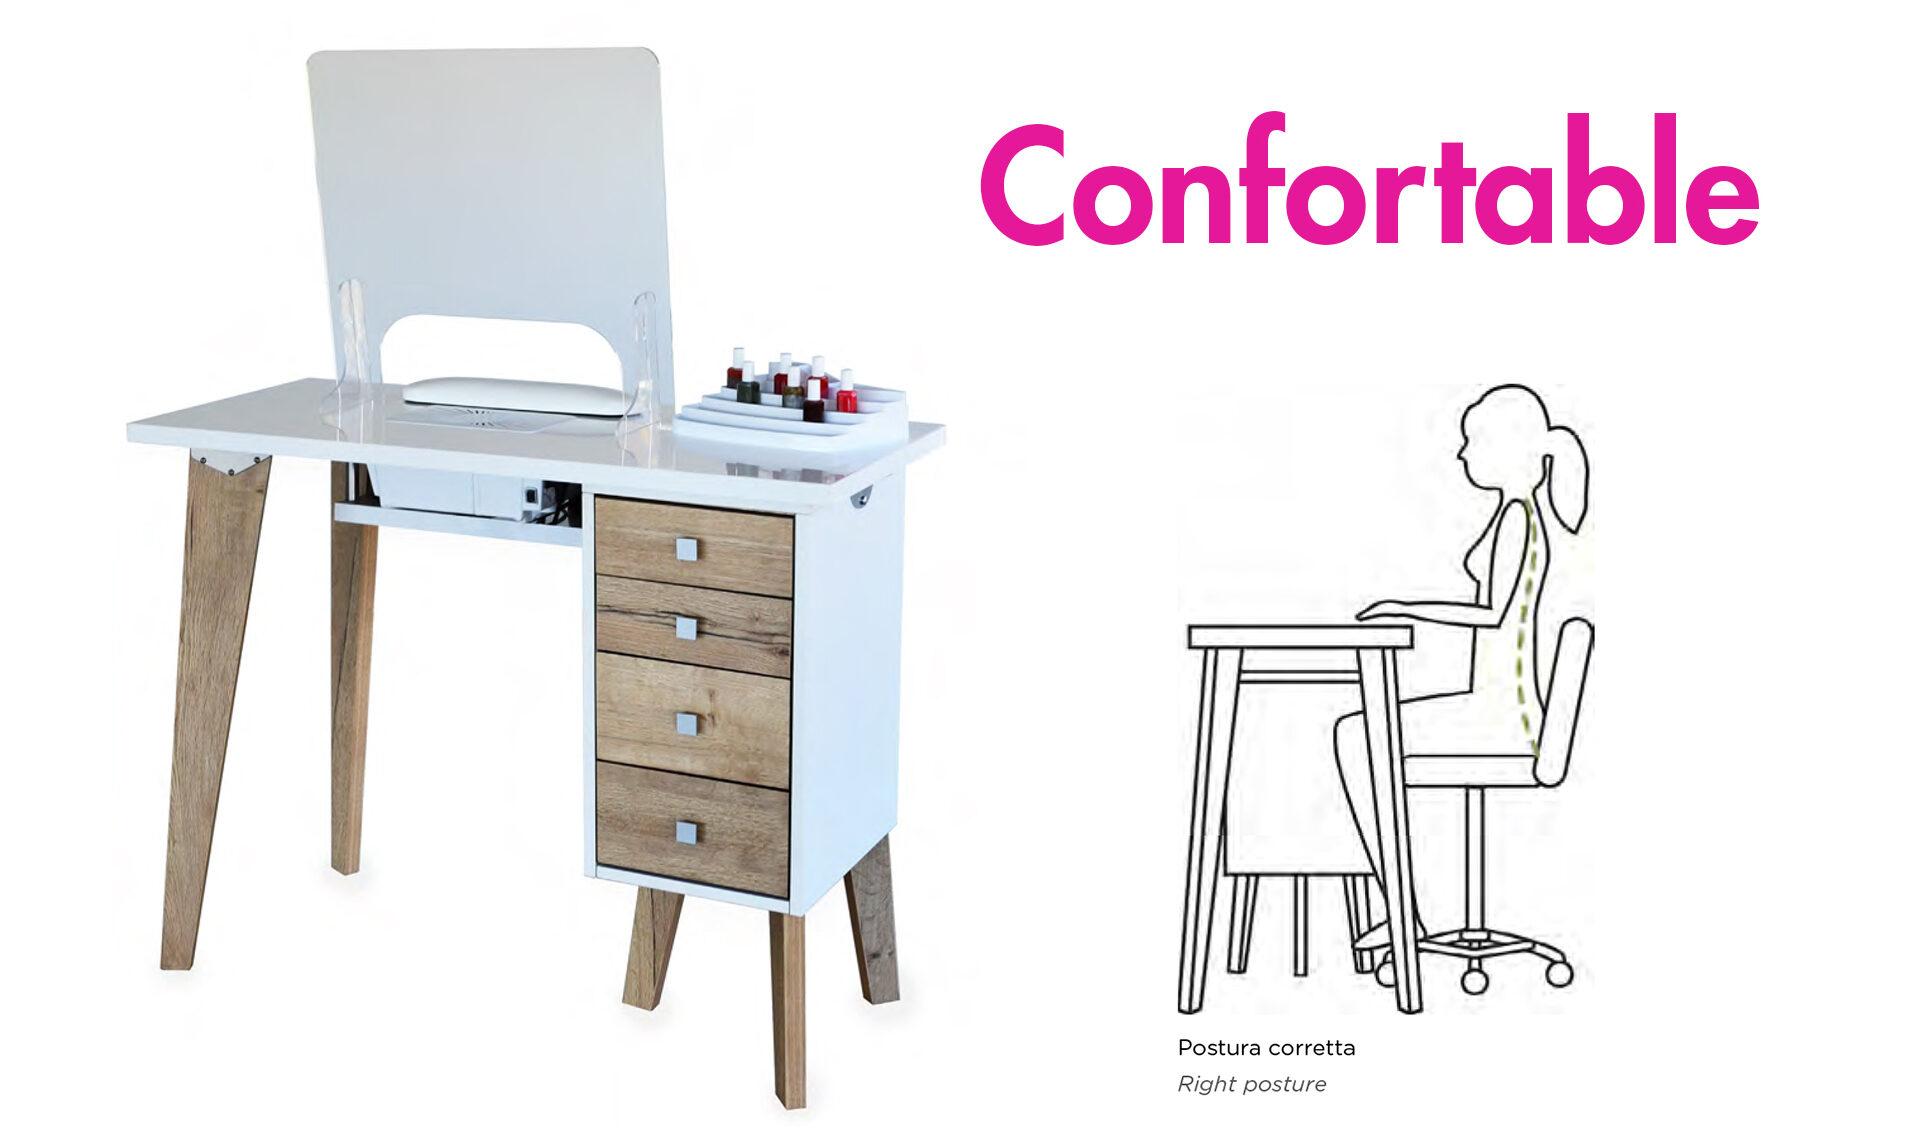 Confortable Table Manicure